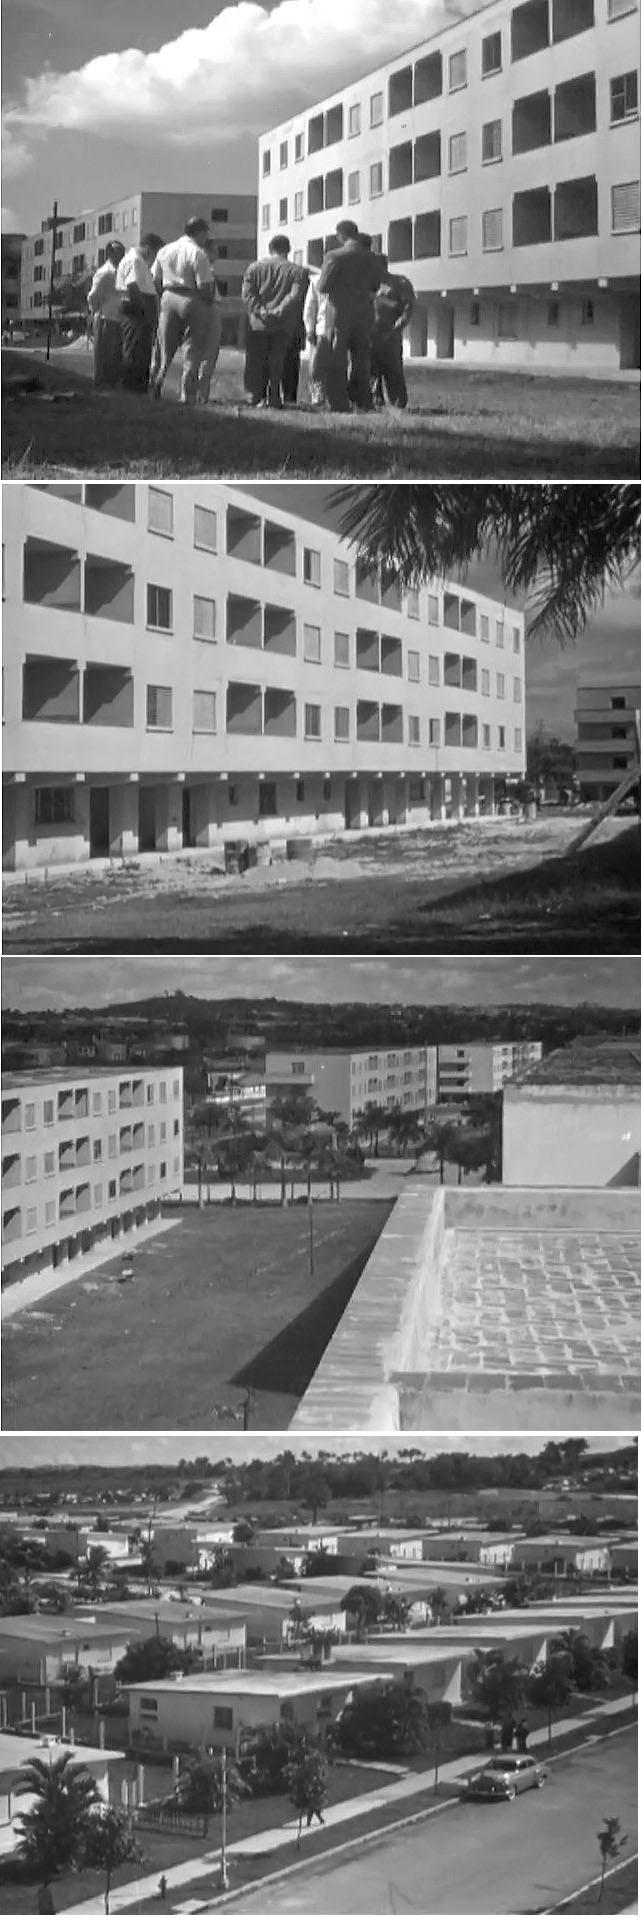 1958 - FOTOS DE CUBA ! SOLAMENTES DE ANTES DEL 1958 !!!! - Página 19 Barrio10